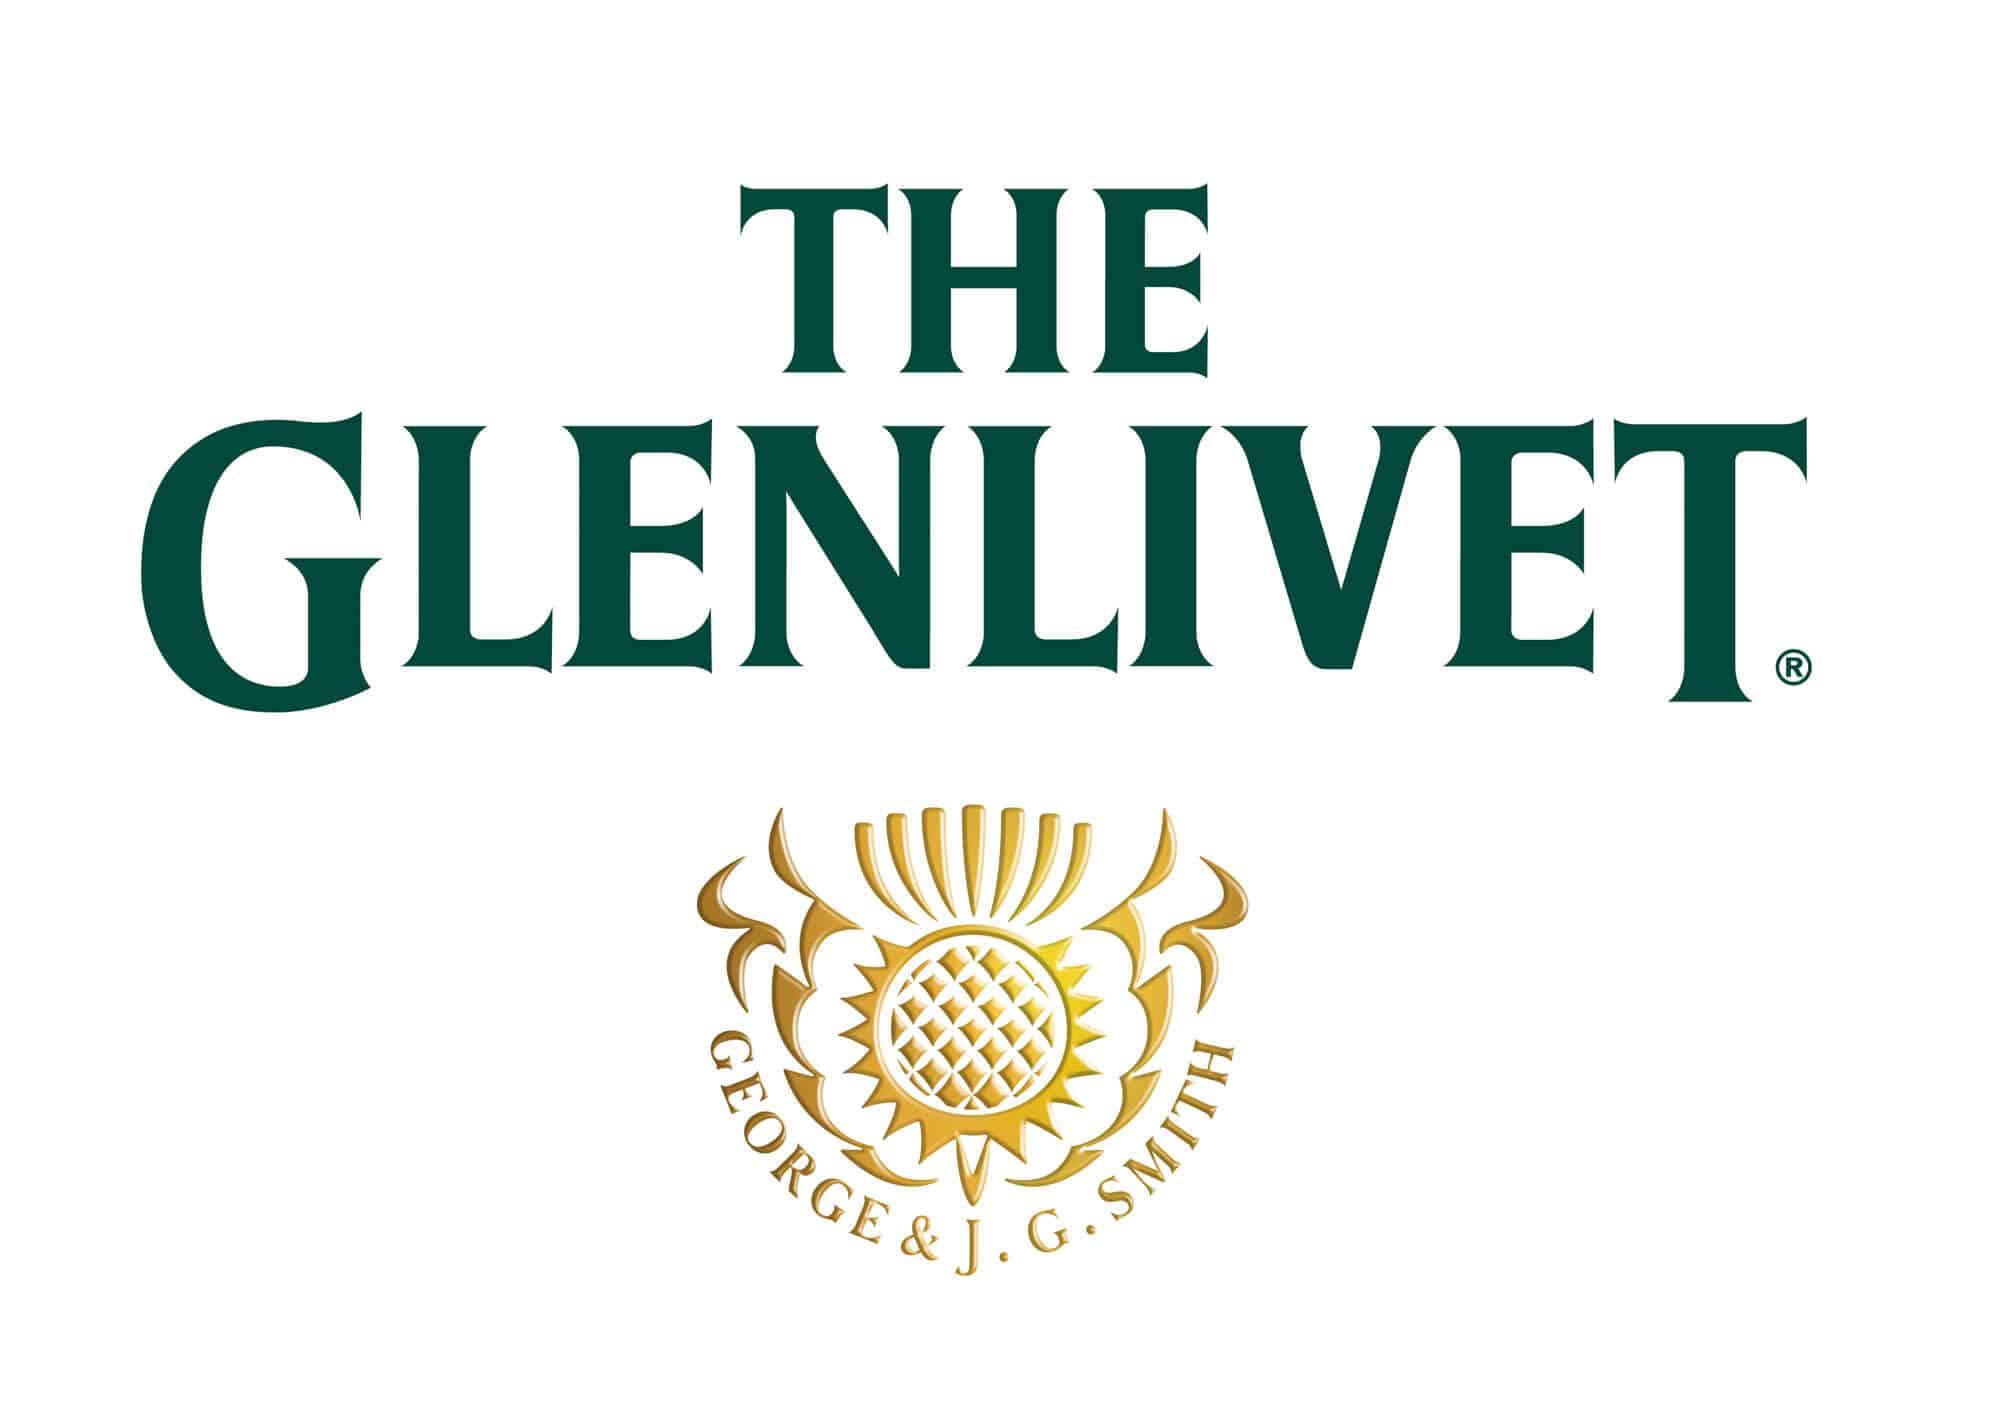 the glenlivet the single malt that started it all